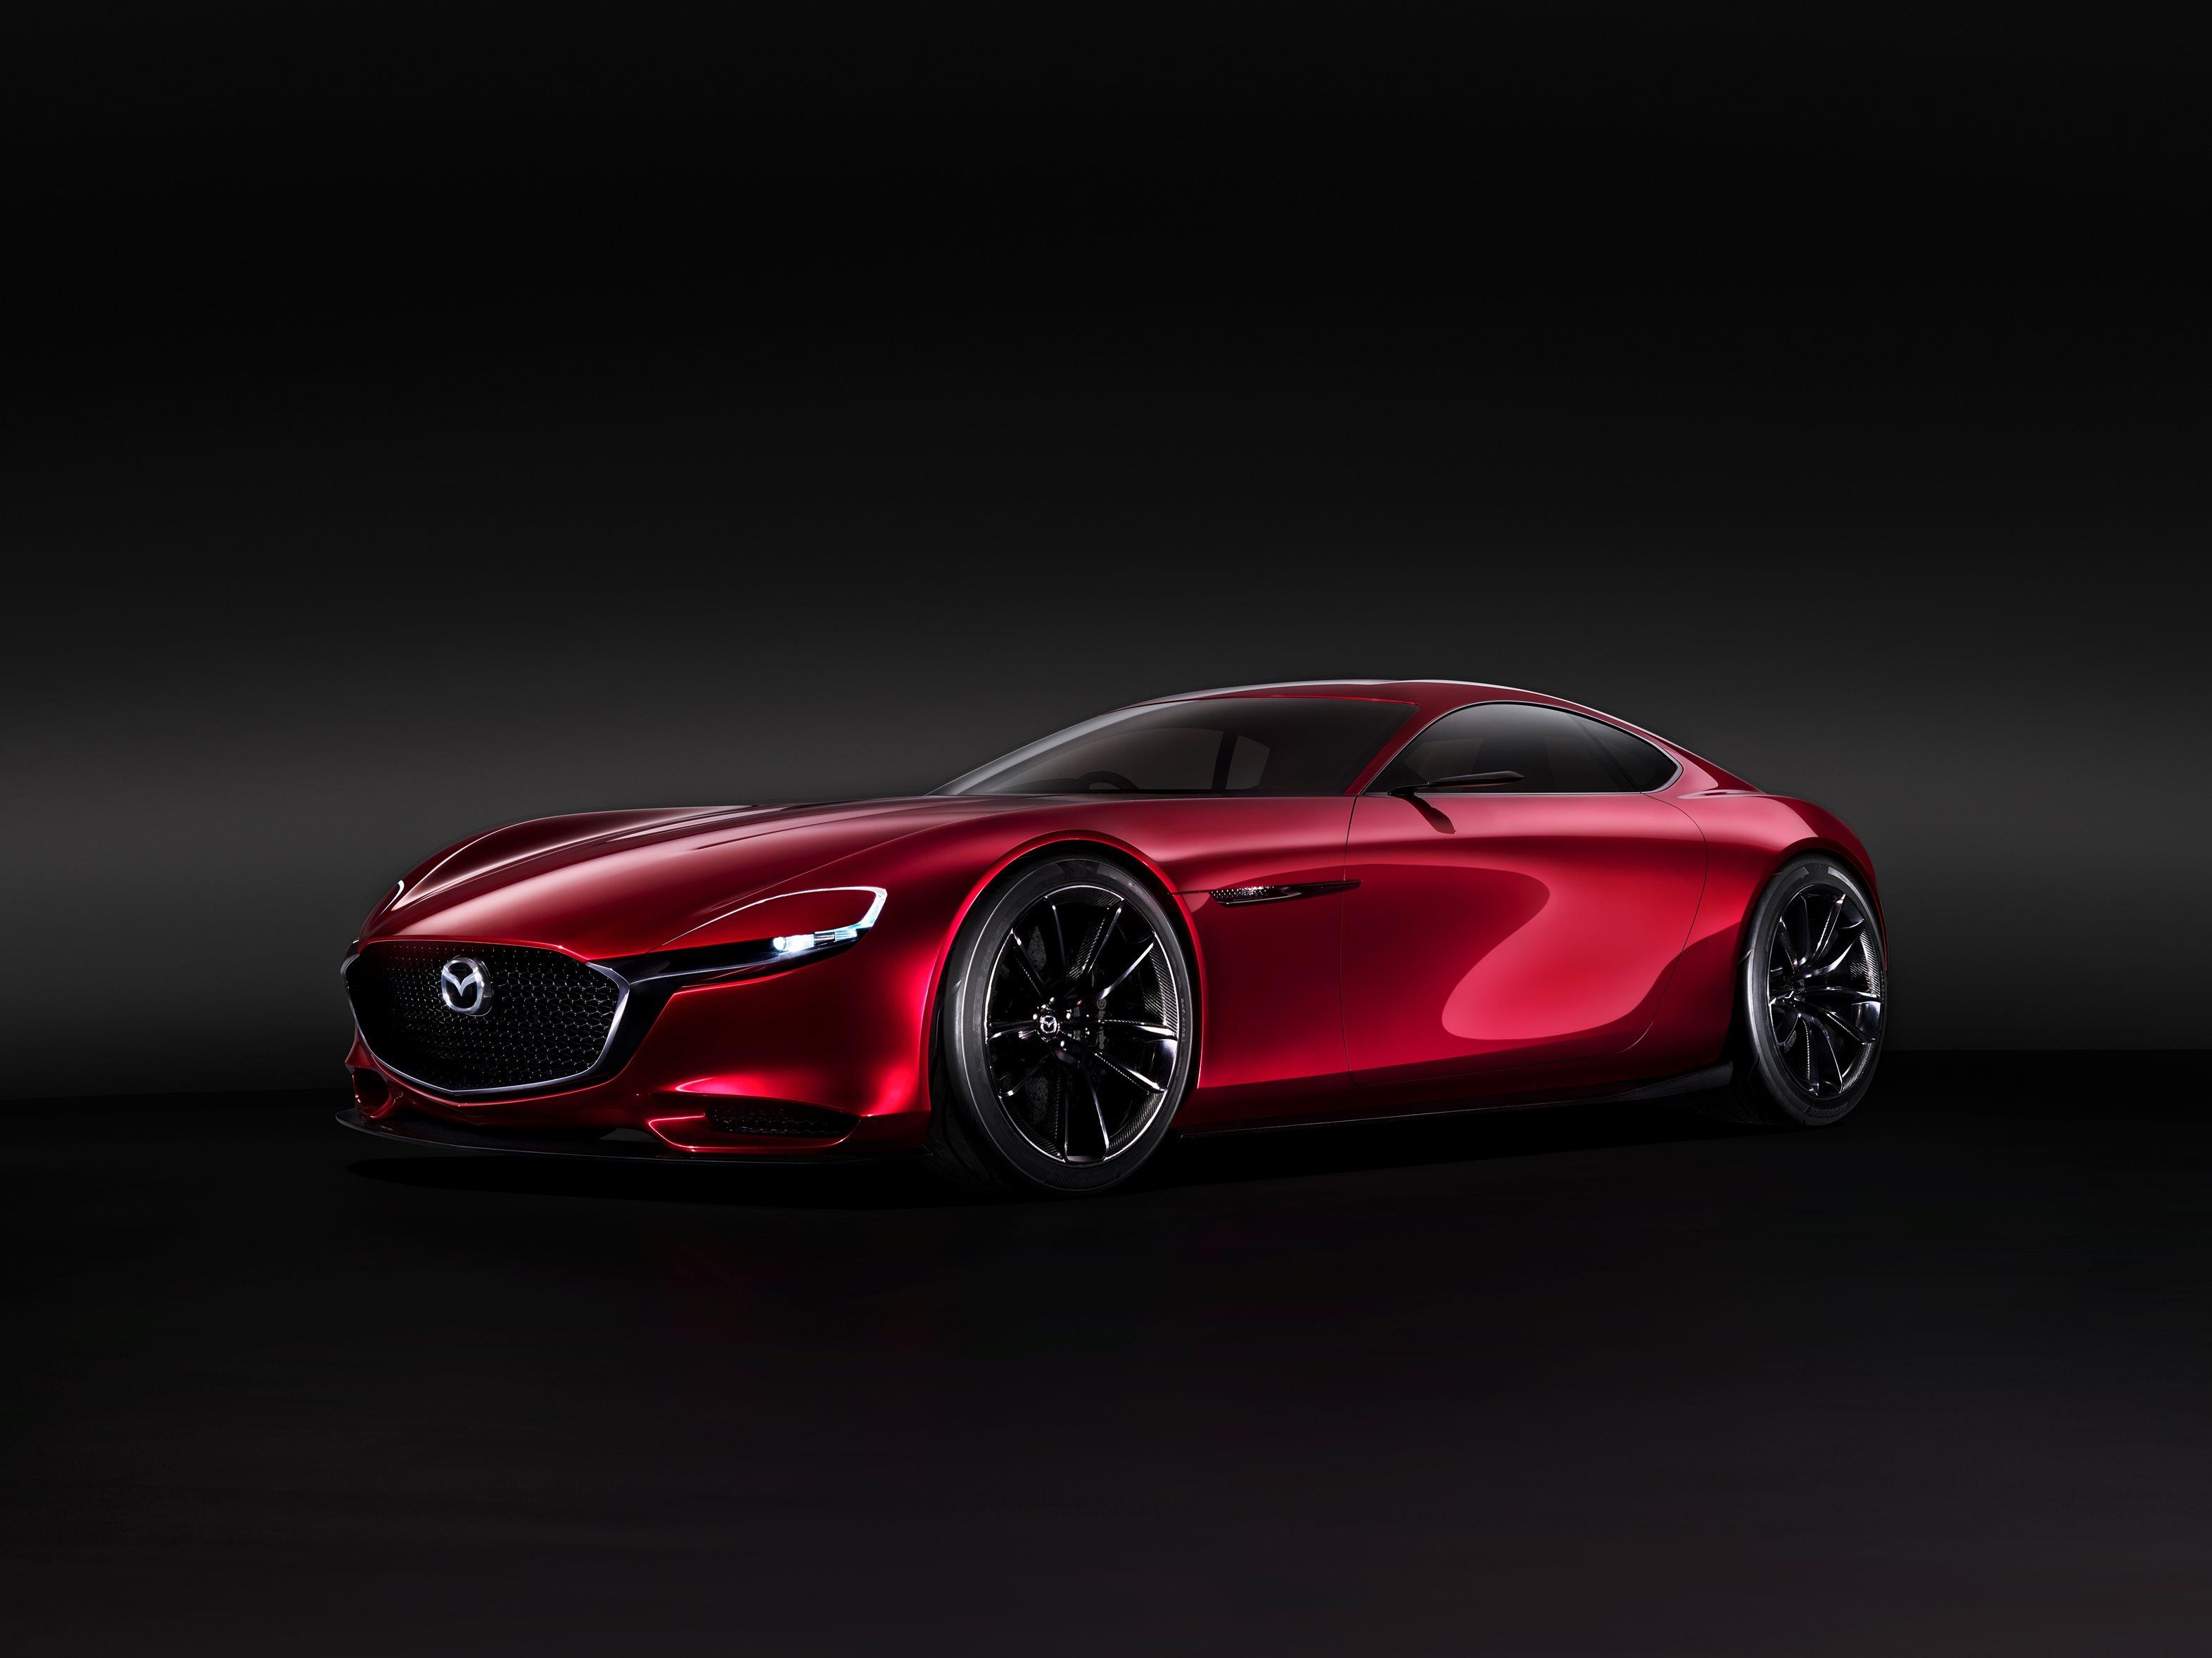 Mazda a Ginevra con due anteprime europee